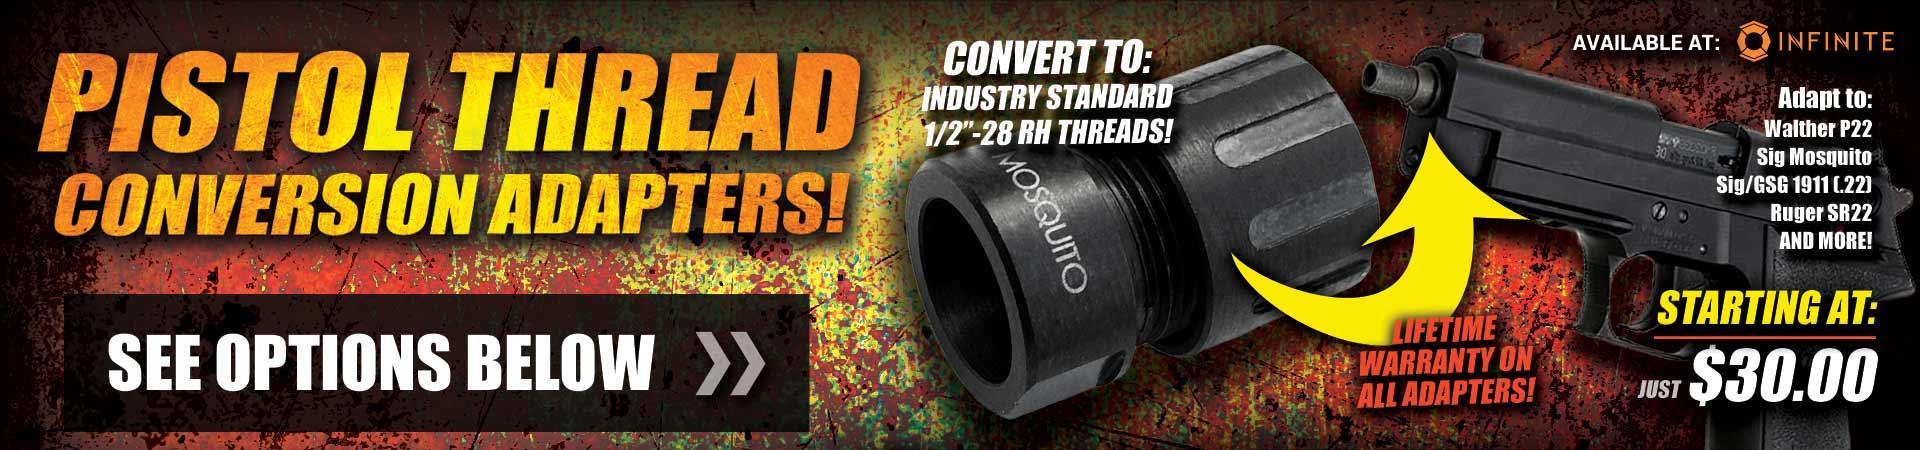 pistol-thread-conversion-adapters-1-1-17.jpg